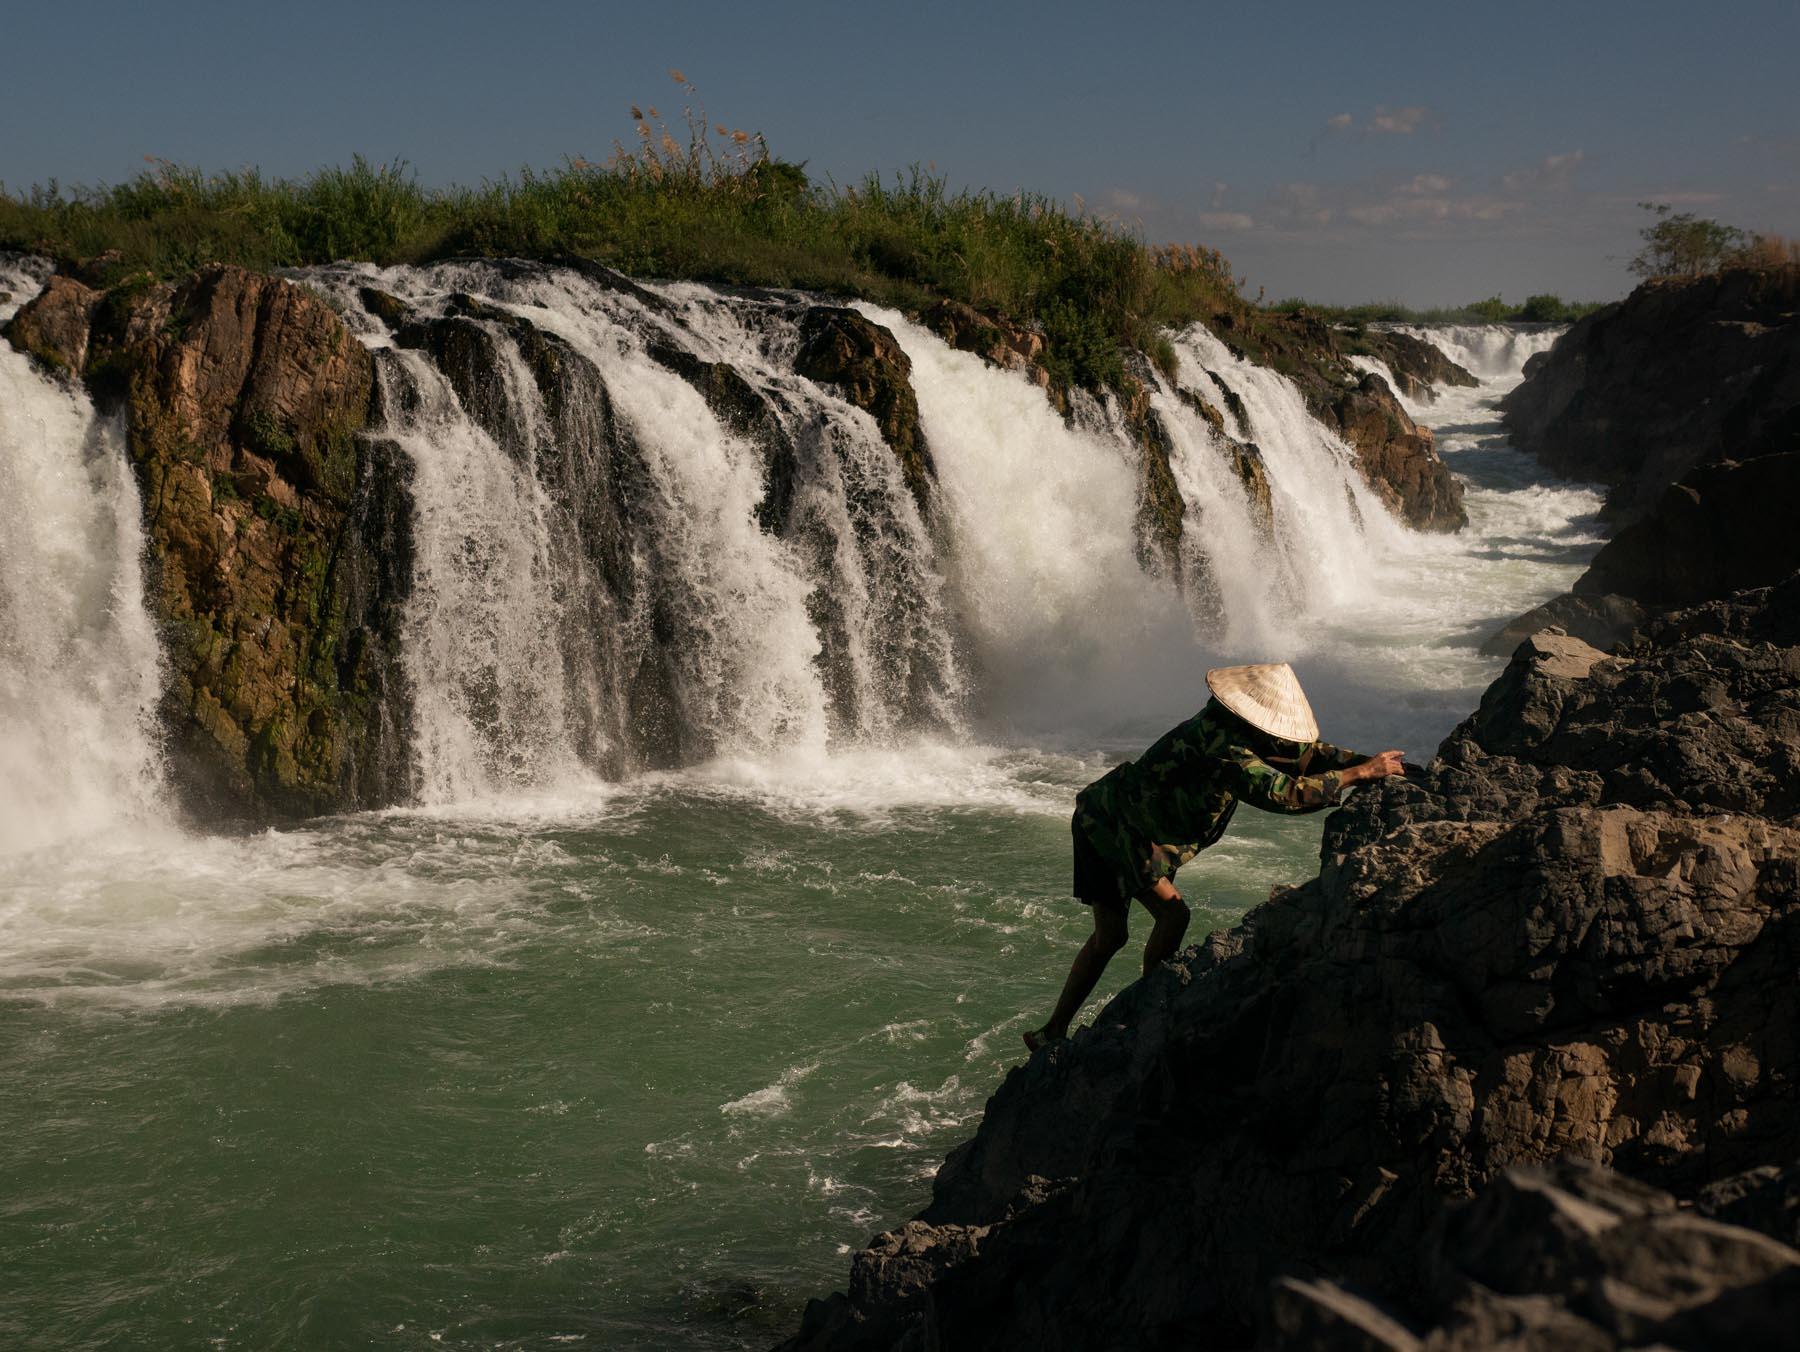 02_Mekong-Laos